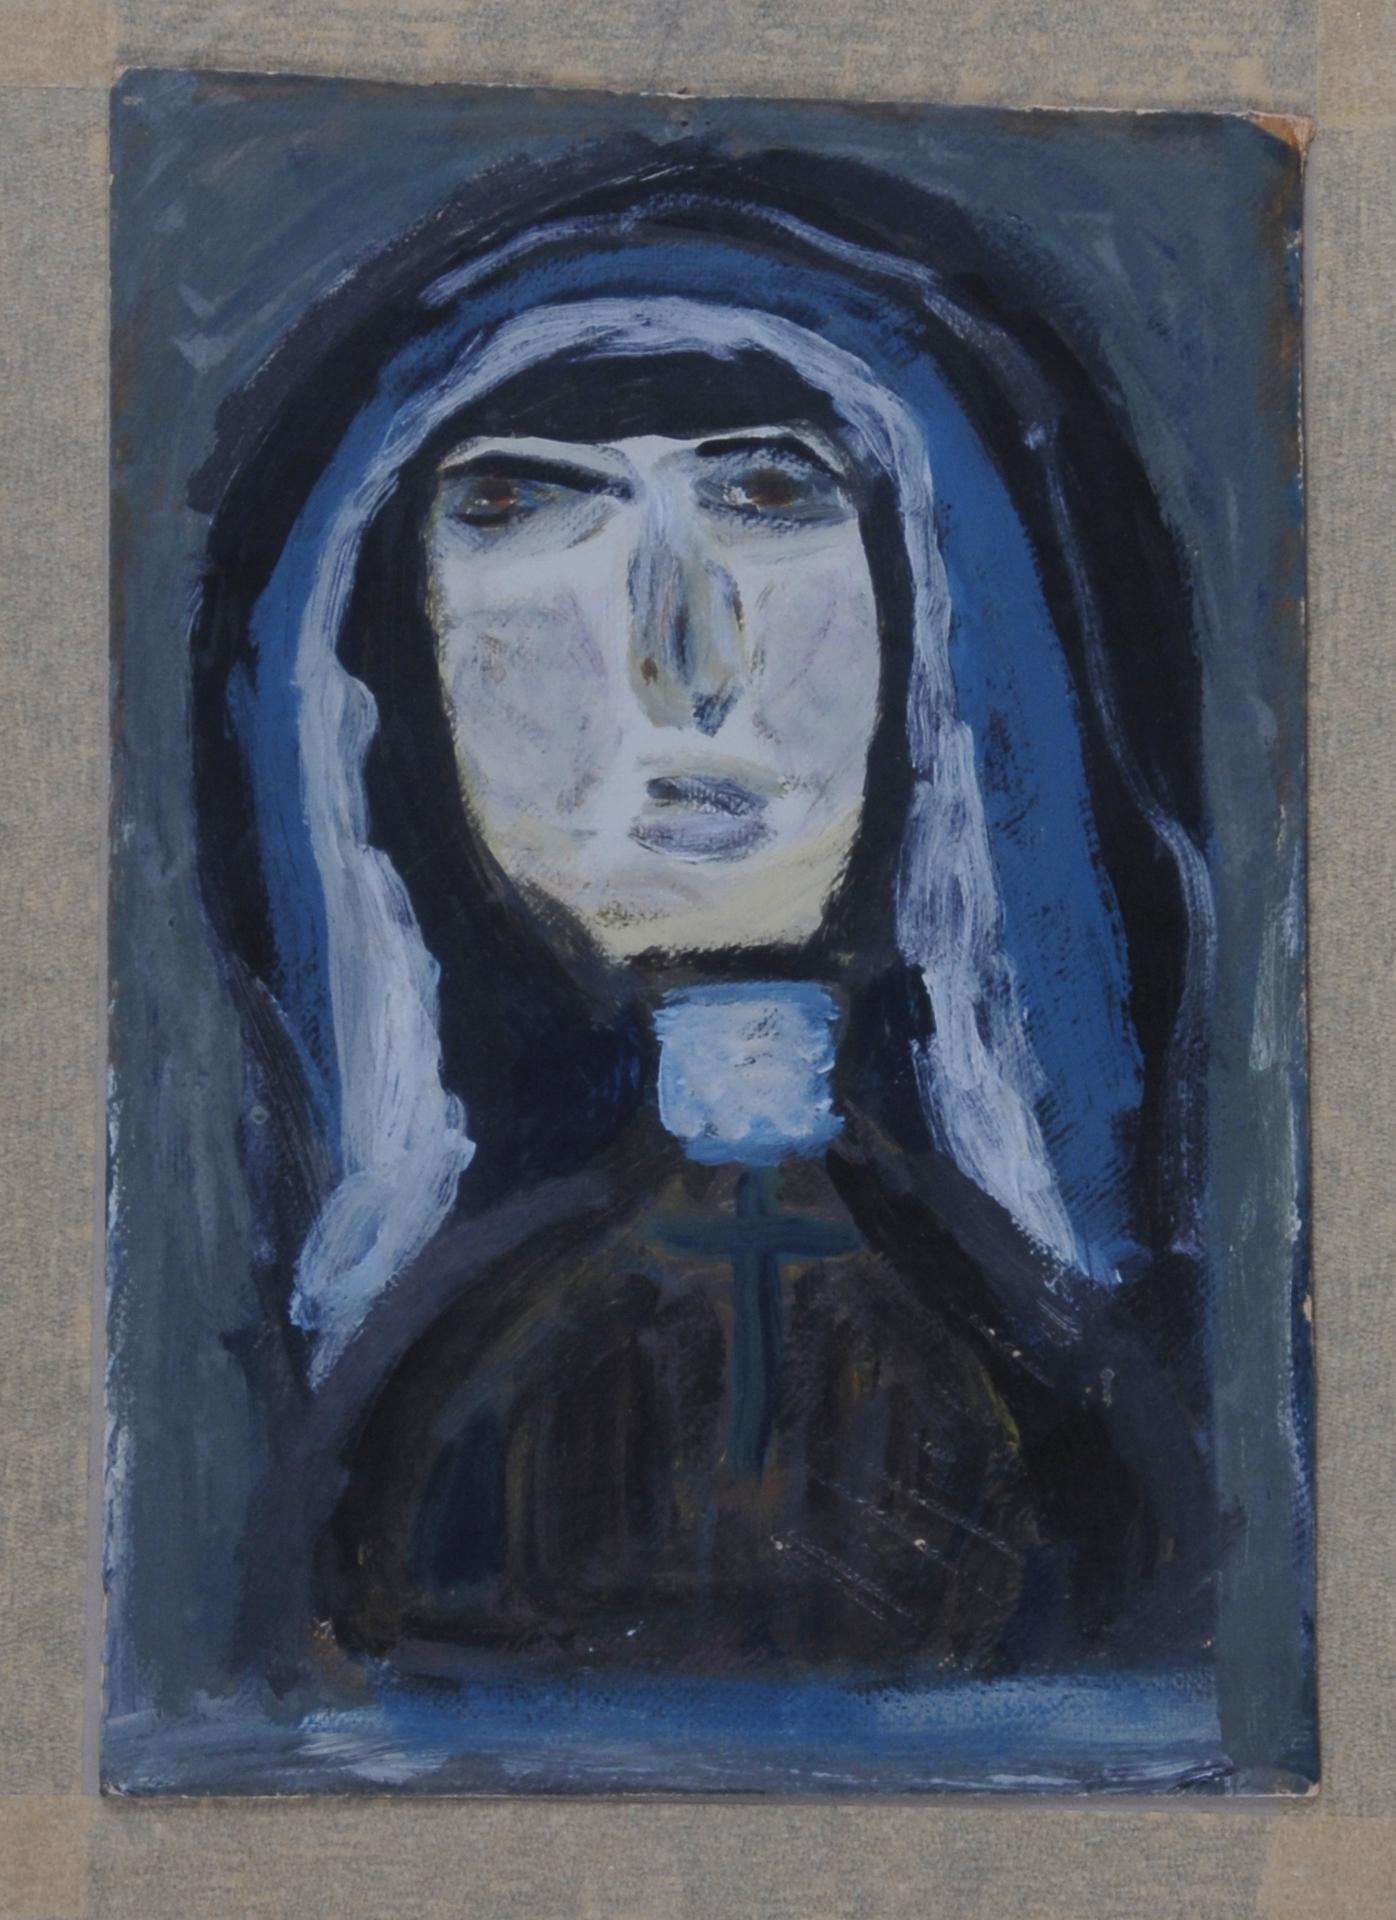 Steffen Walter, 2 paintings: Nonne (Nun); Landschaftsskizze (Landscape Sketch)